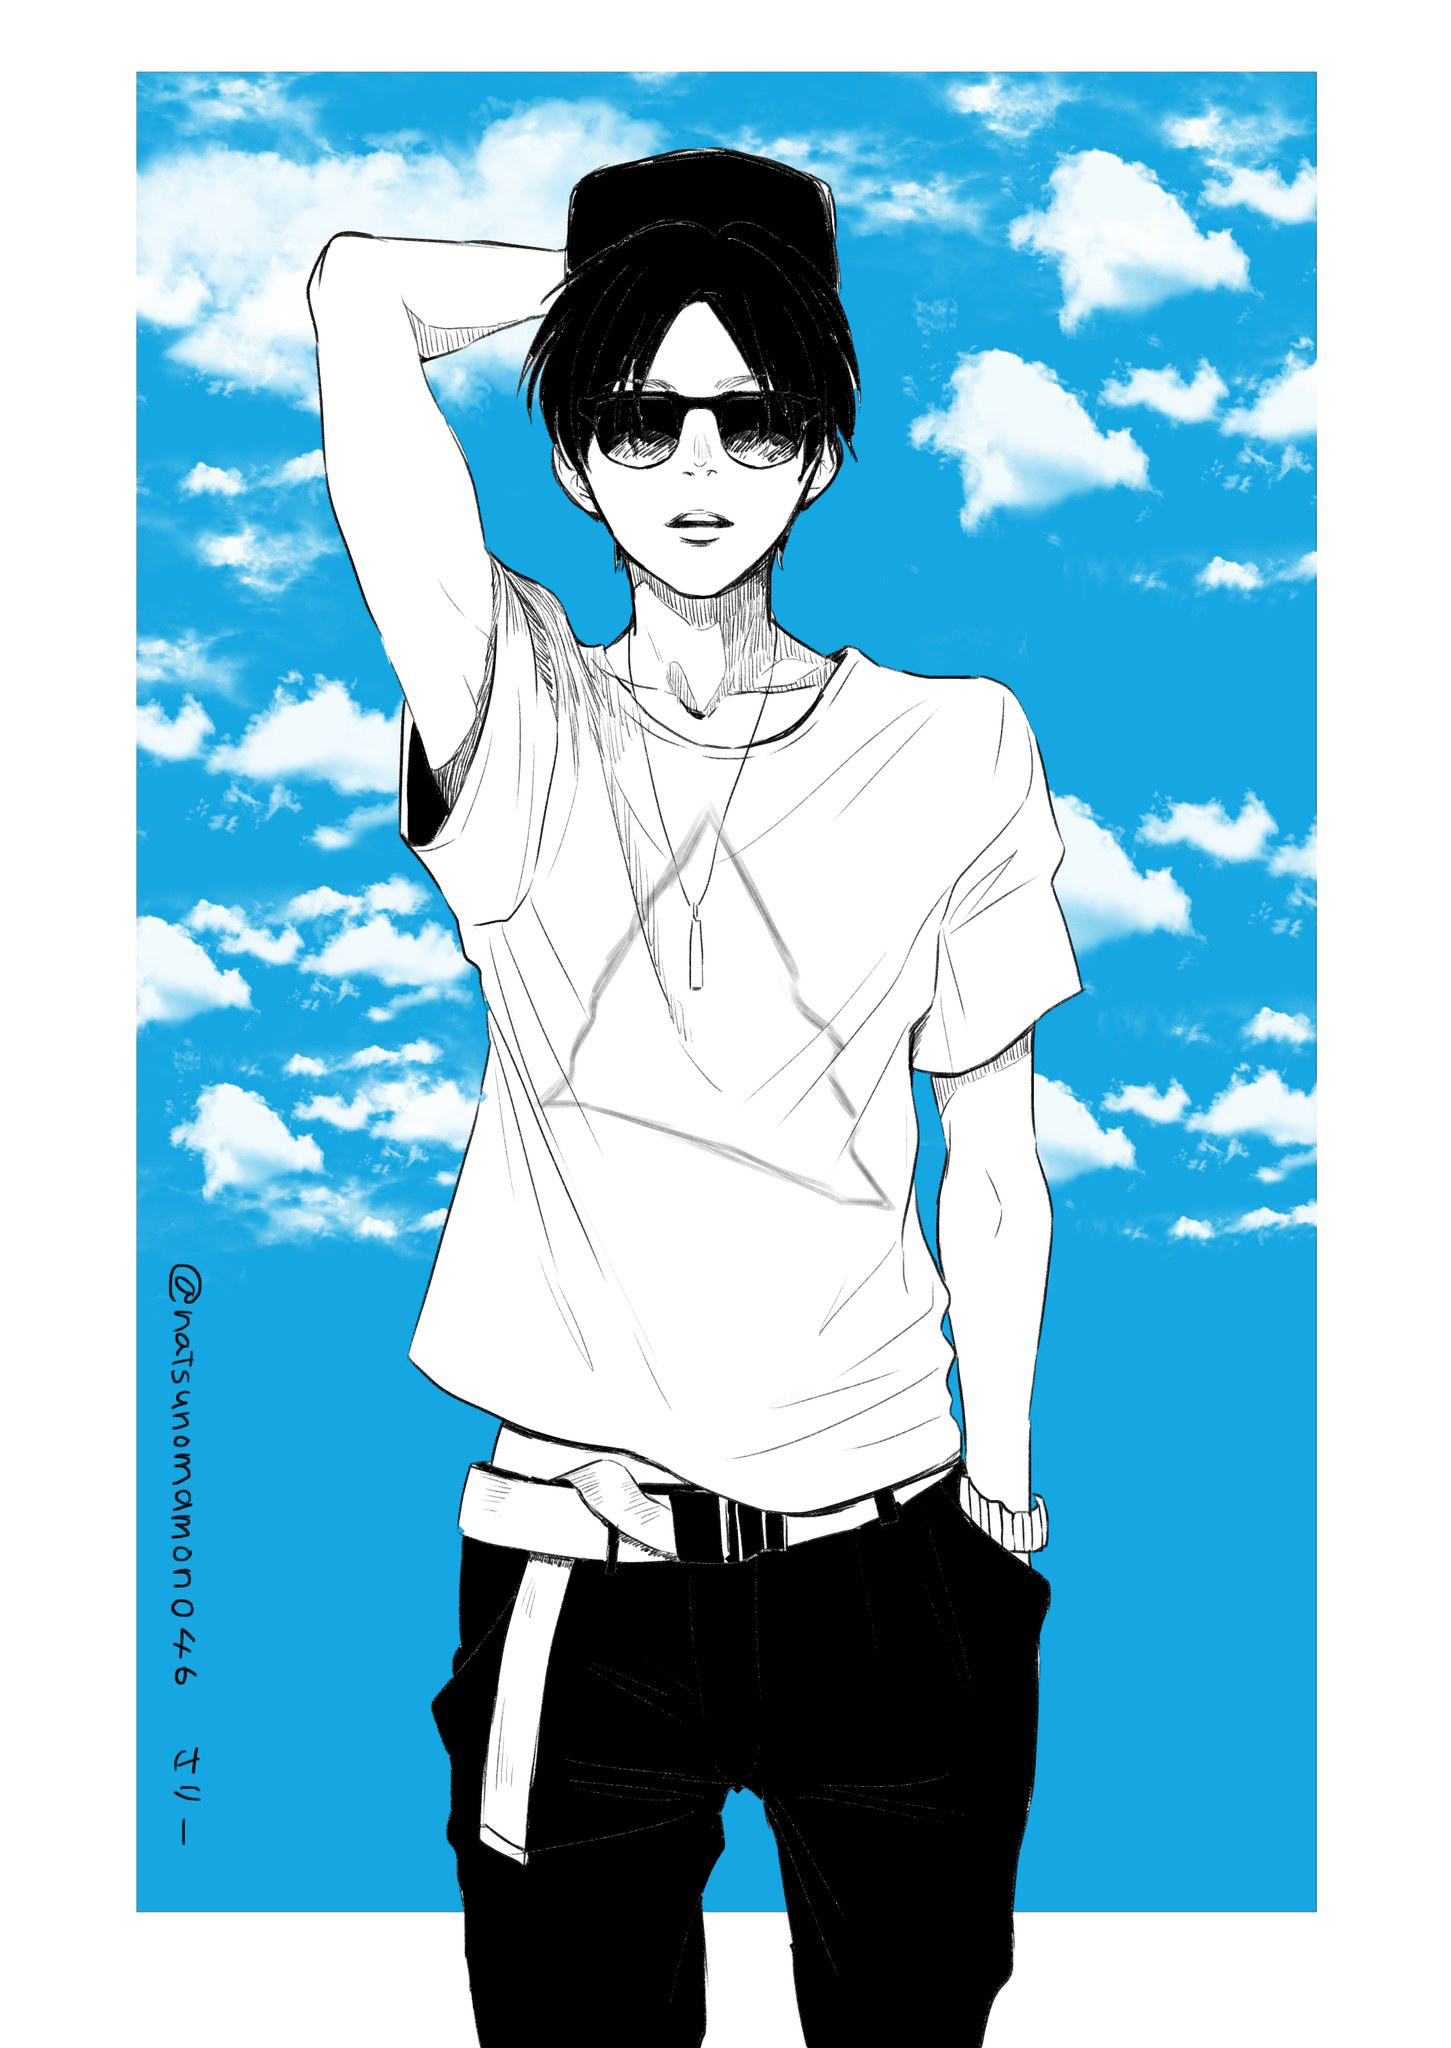 Pin by Lindsay Arnez on Manga y anime | Pinterest | Ereri, Anime and ...